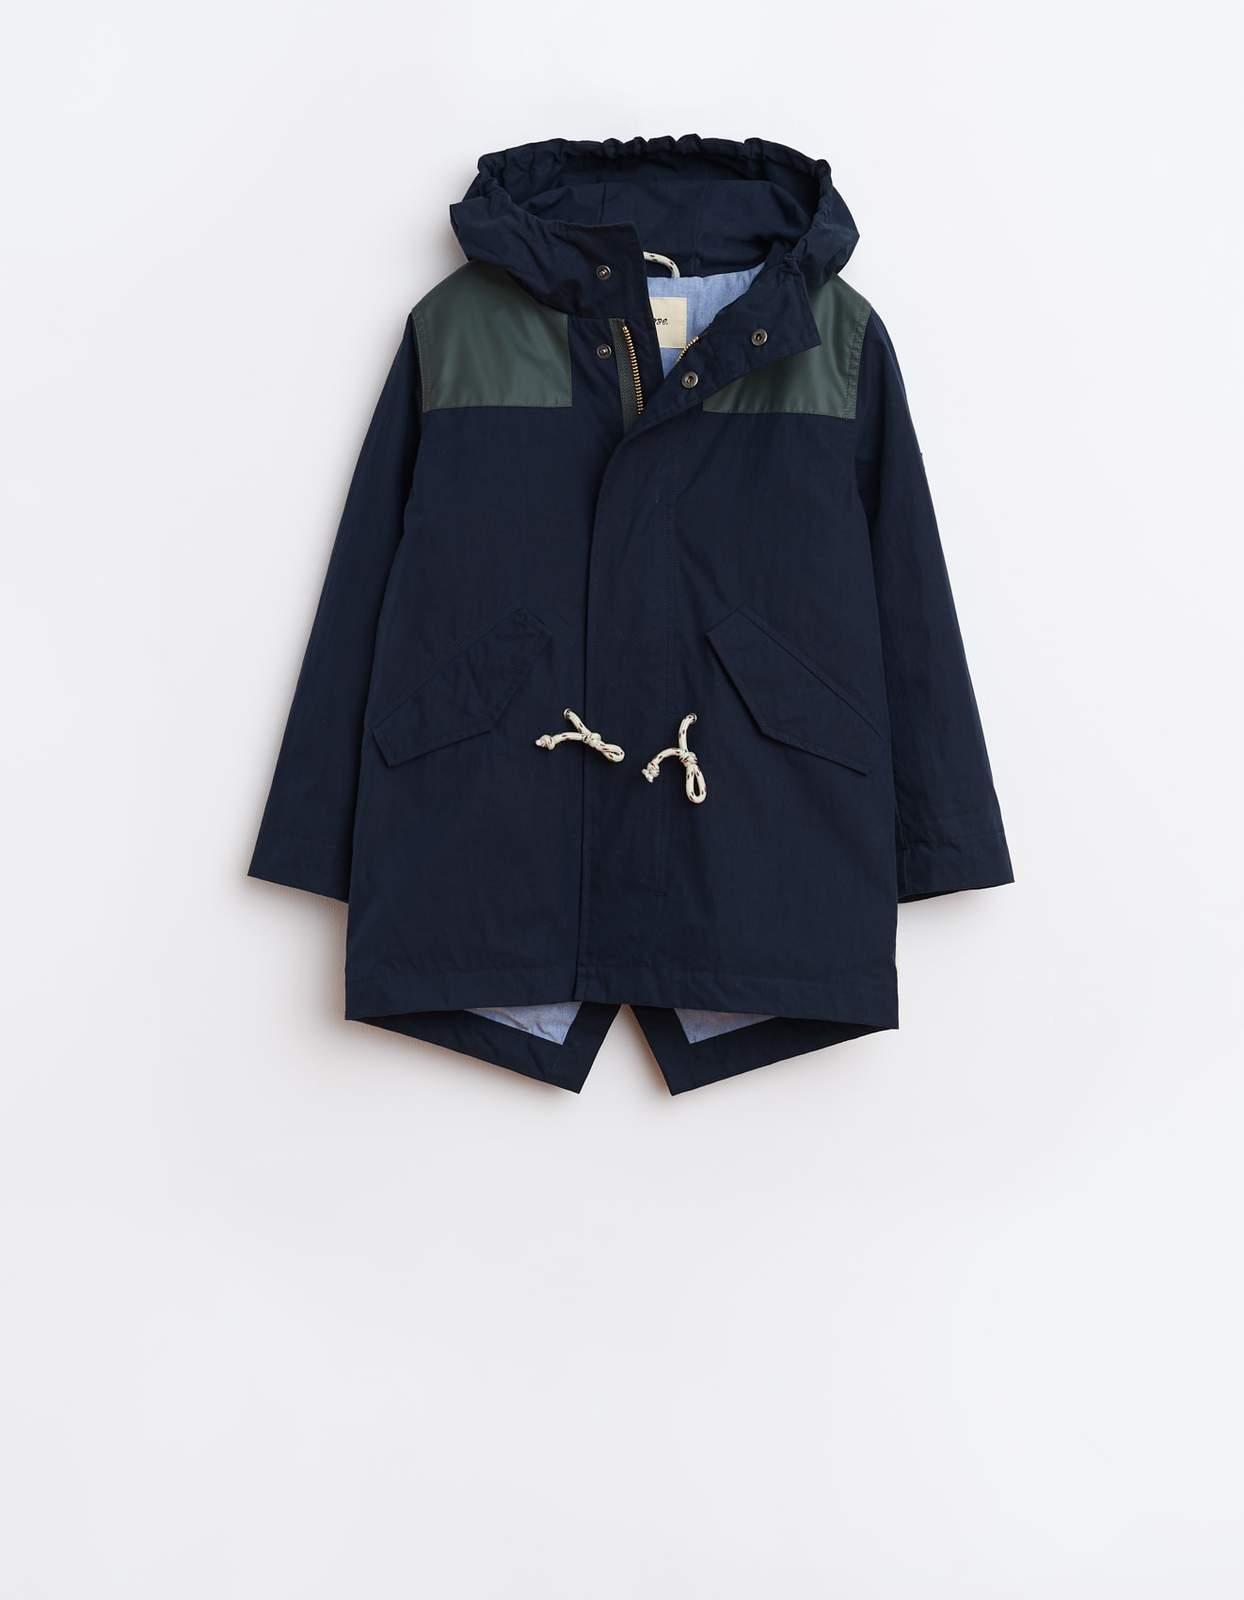 BLR-hynno-P1009-america-jacket_1600x1600.jpg